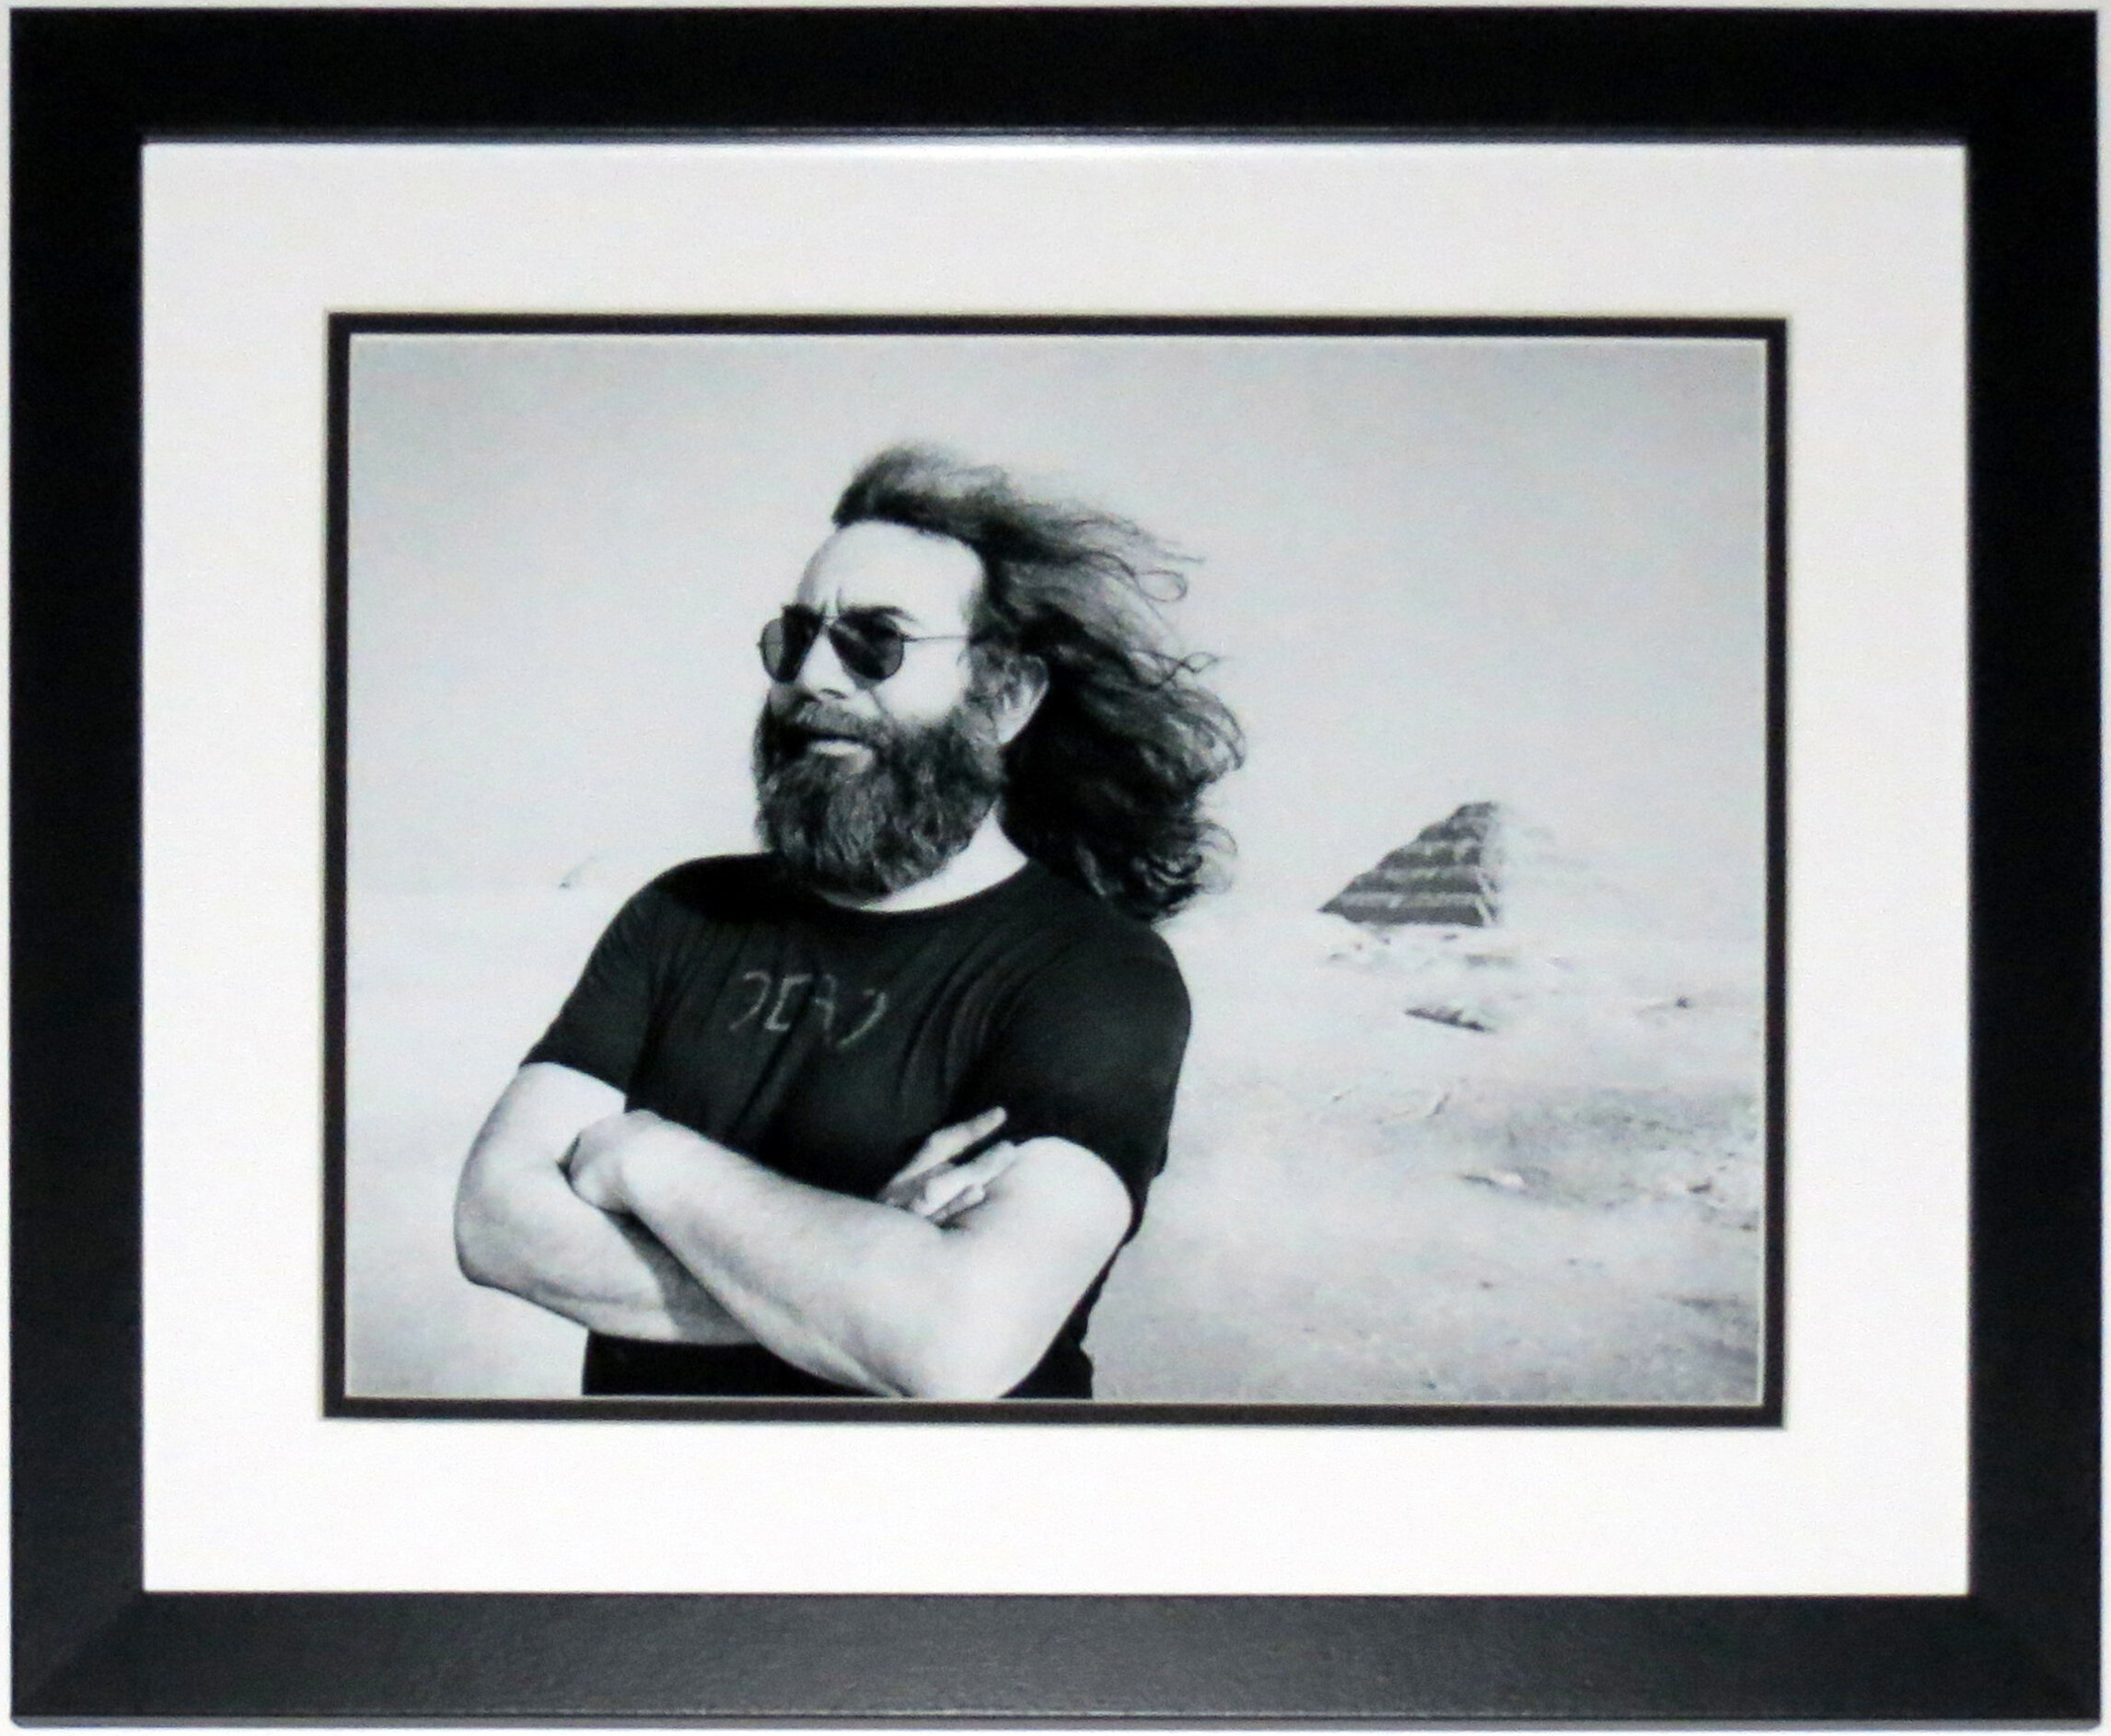 Jerry Garcia Grateful Dead Egypt 11x14 Photo - Professionally Framed